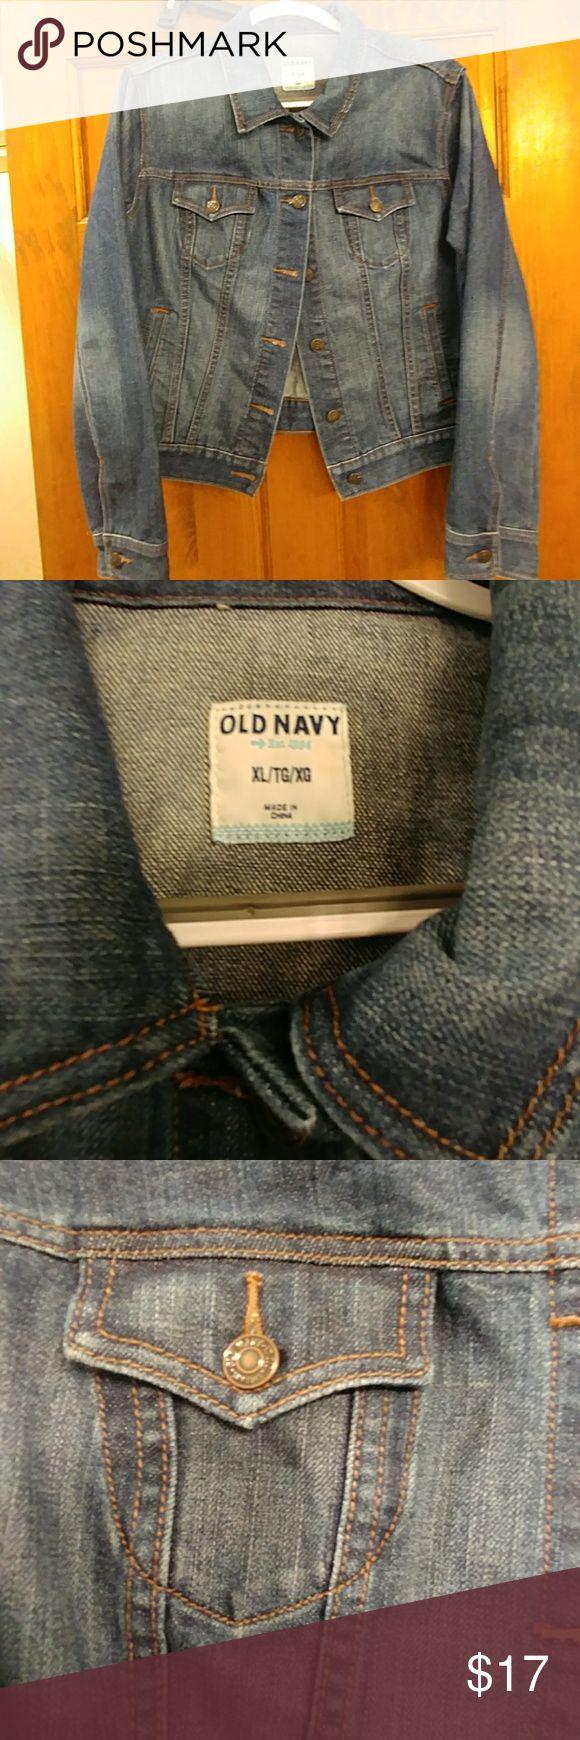 Ladies Old Navy Jean Jacket Size XL Ladies Jean Jacket. Used in great condition. Old Navy. Old Navy Jackets & Coats Jean Jackets